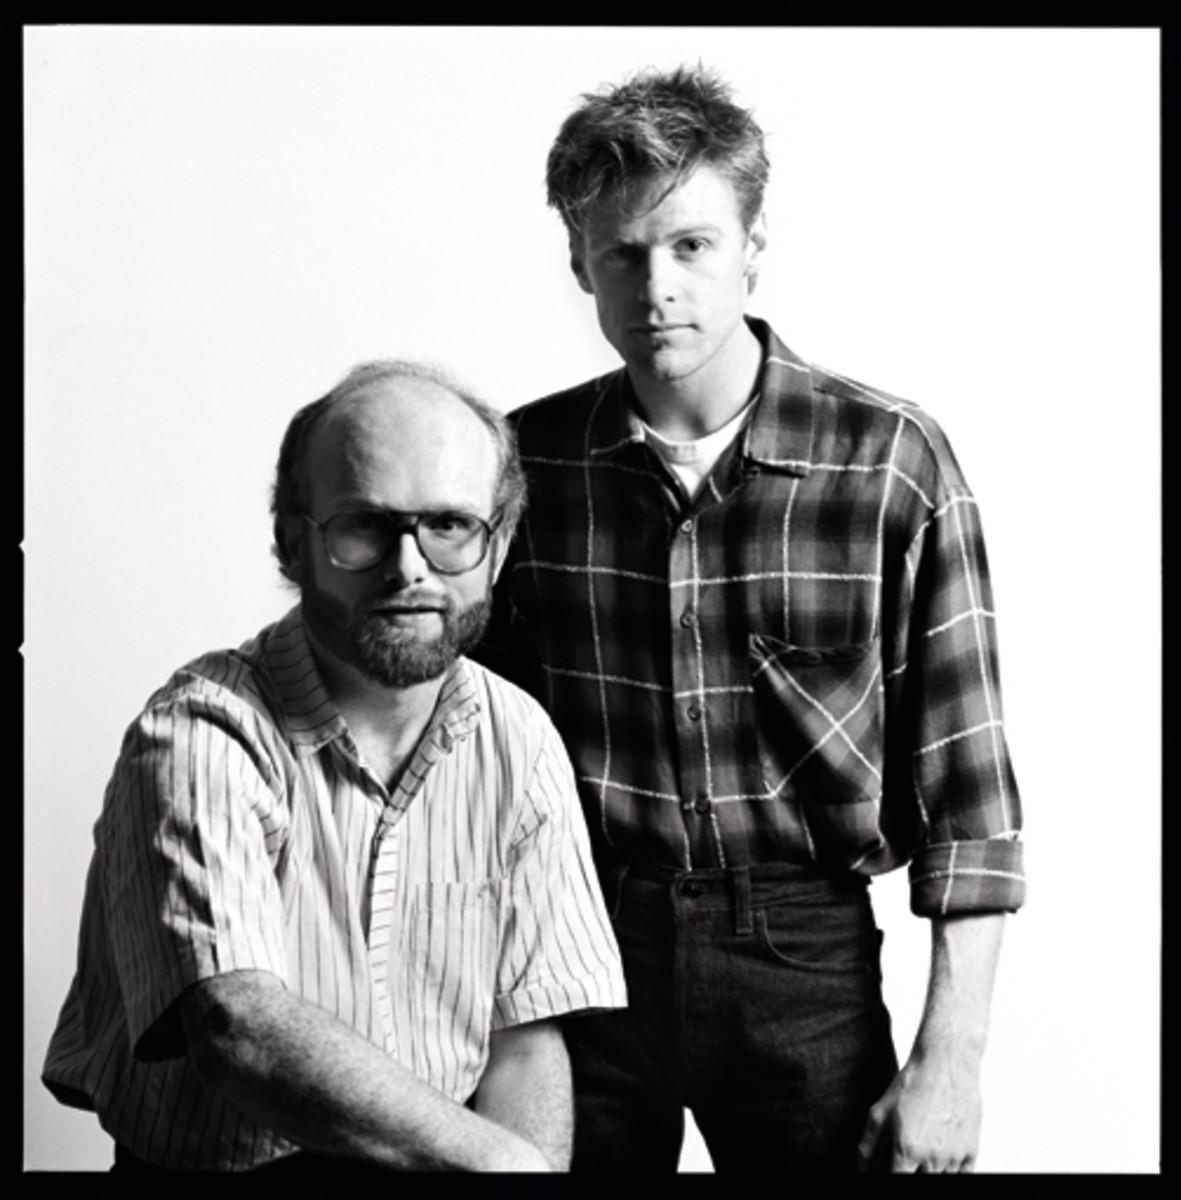 Jim Vallance and Bryan Adams. Photo by Hans Sipma.